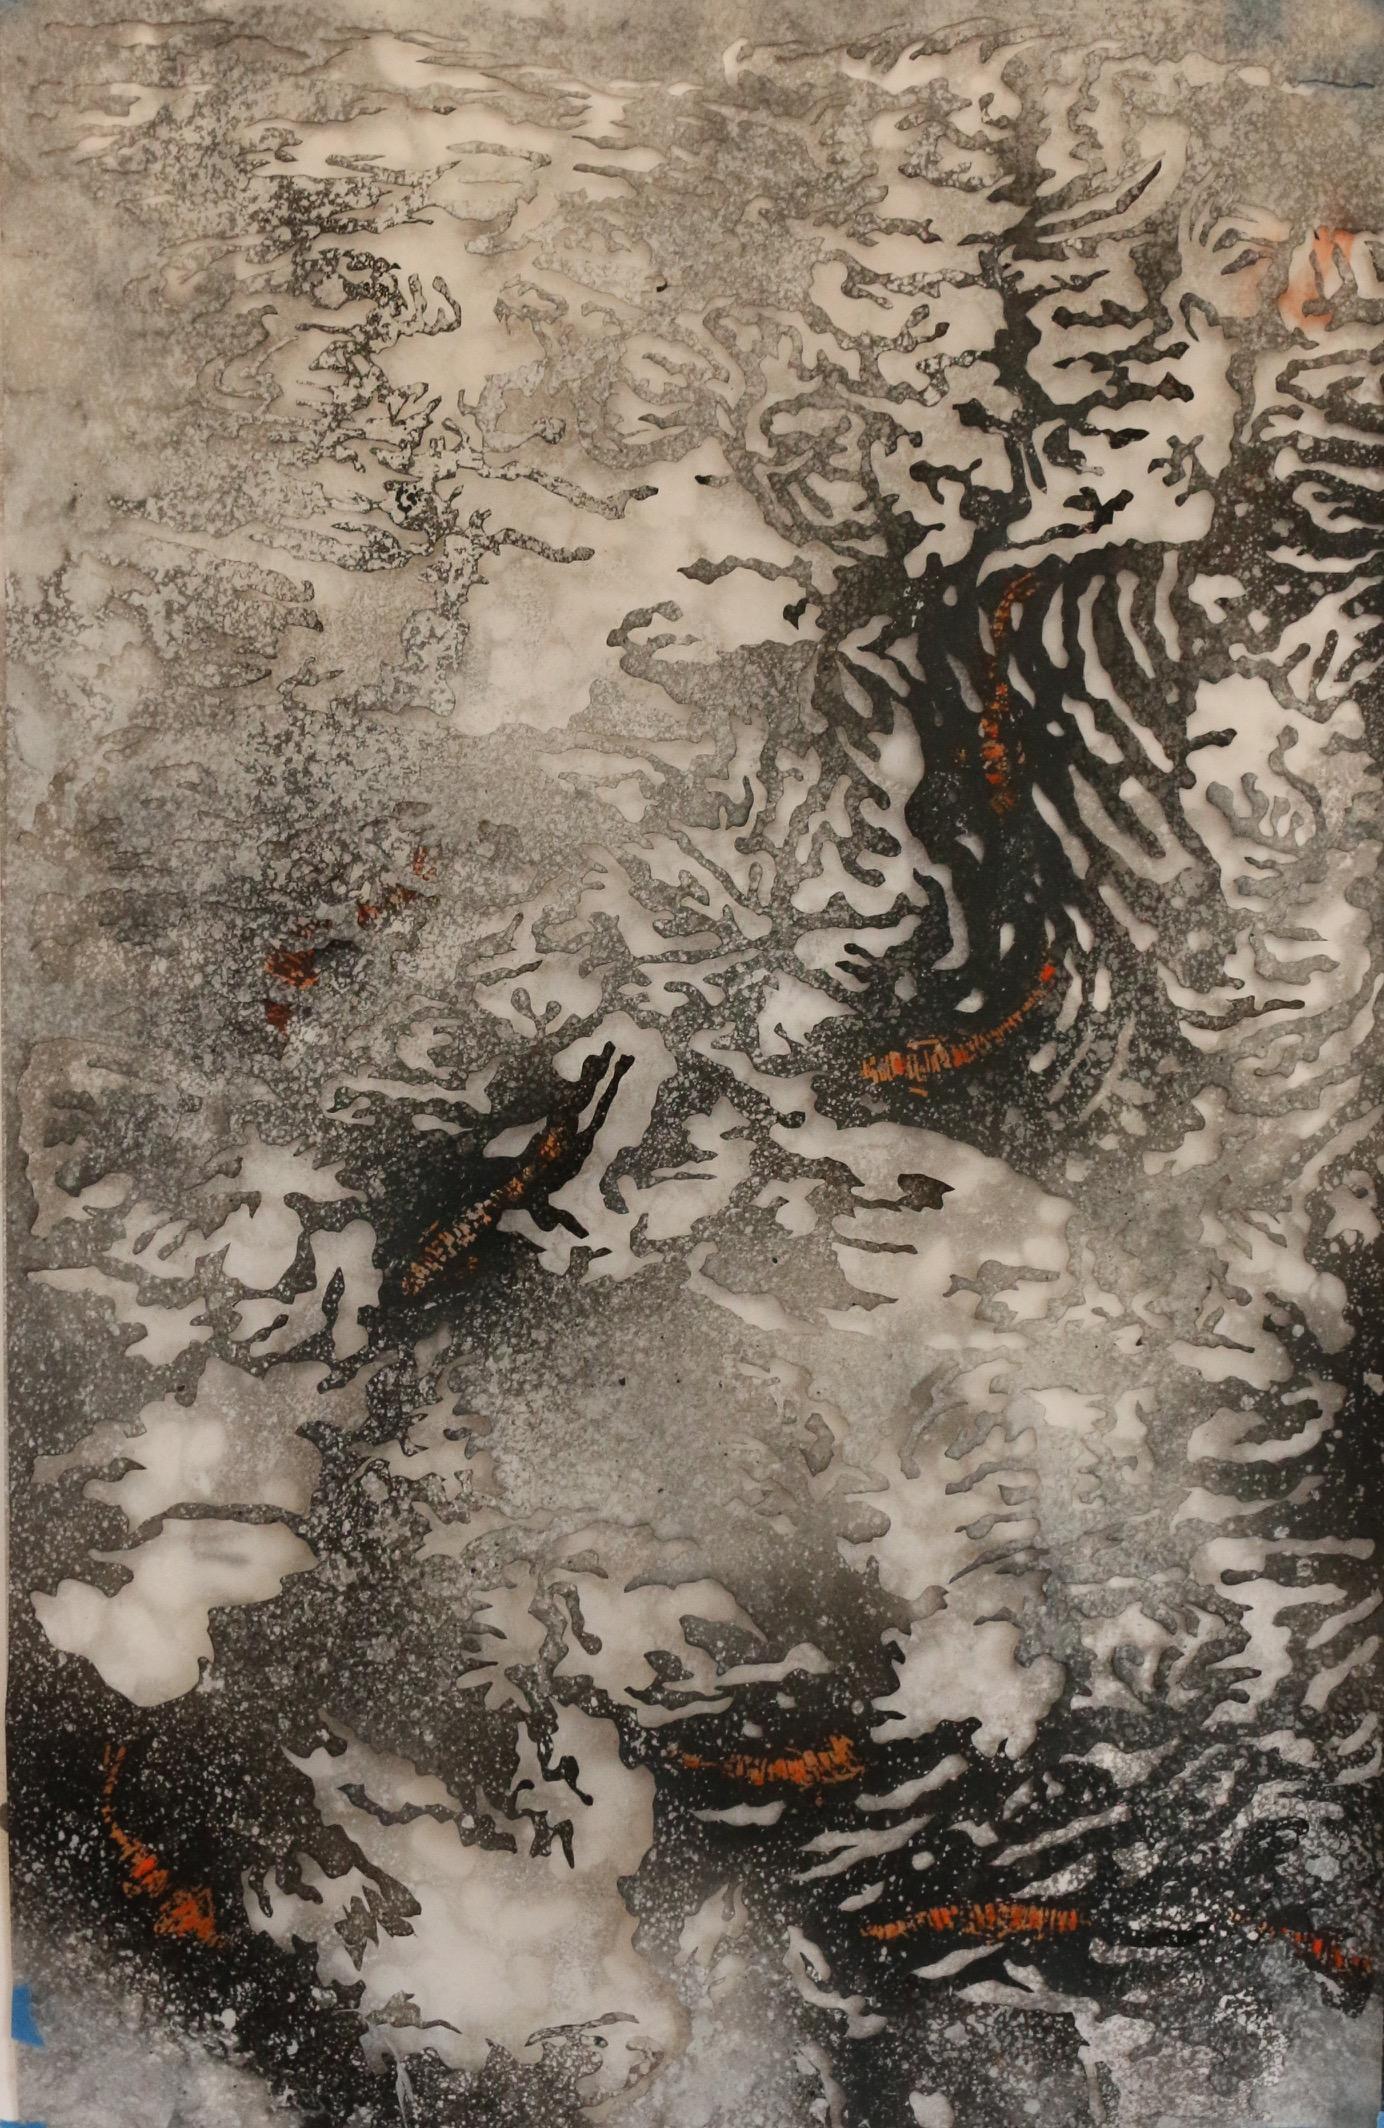 9.The Lily Pond V (Left Panel)